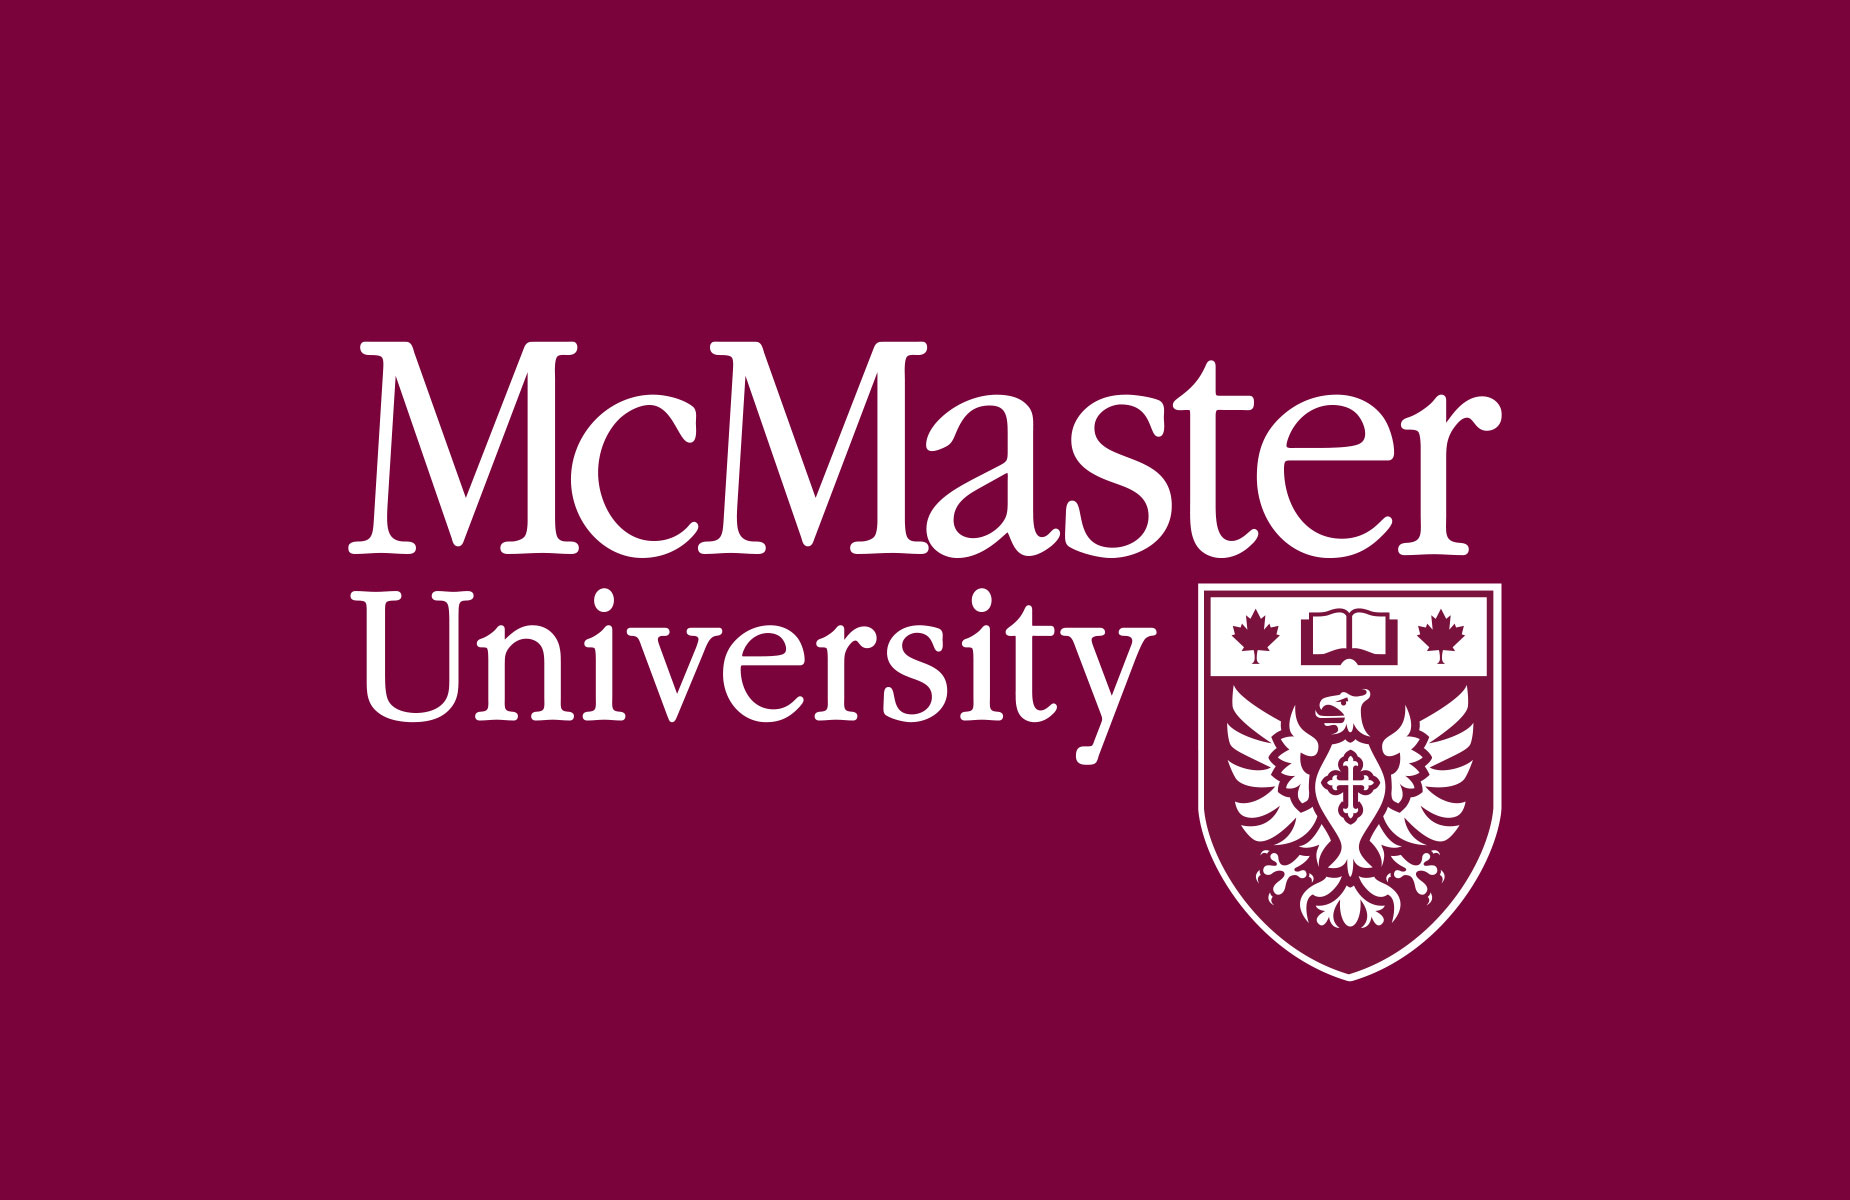 McMaster University - View case study